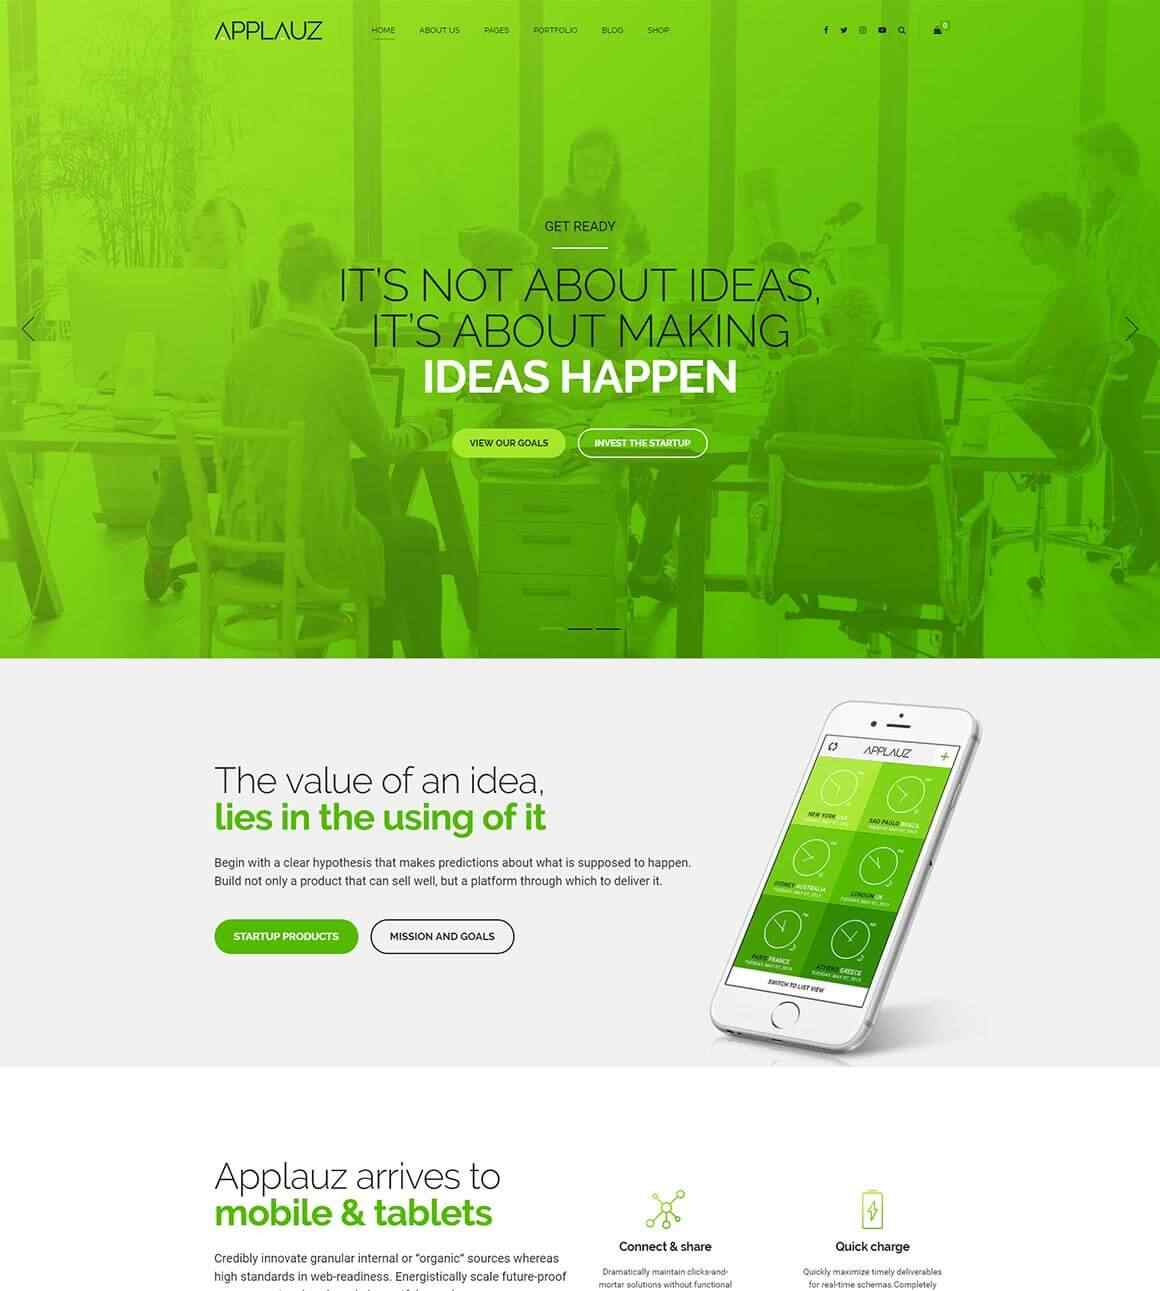 http://www.evidencijaradnogvremena.com/wp-content/uploads/2017/11/Screenshot-Startup.jpg